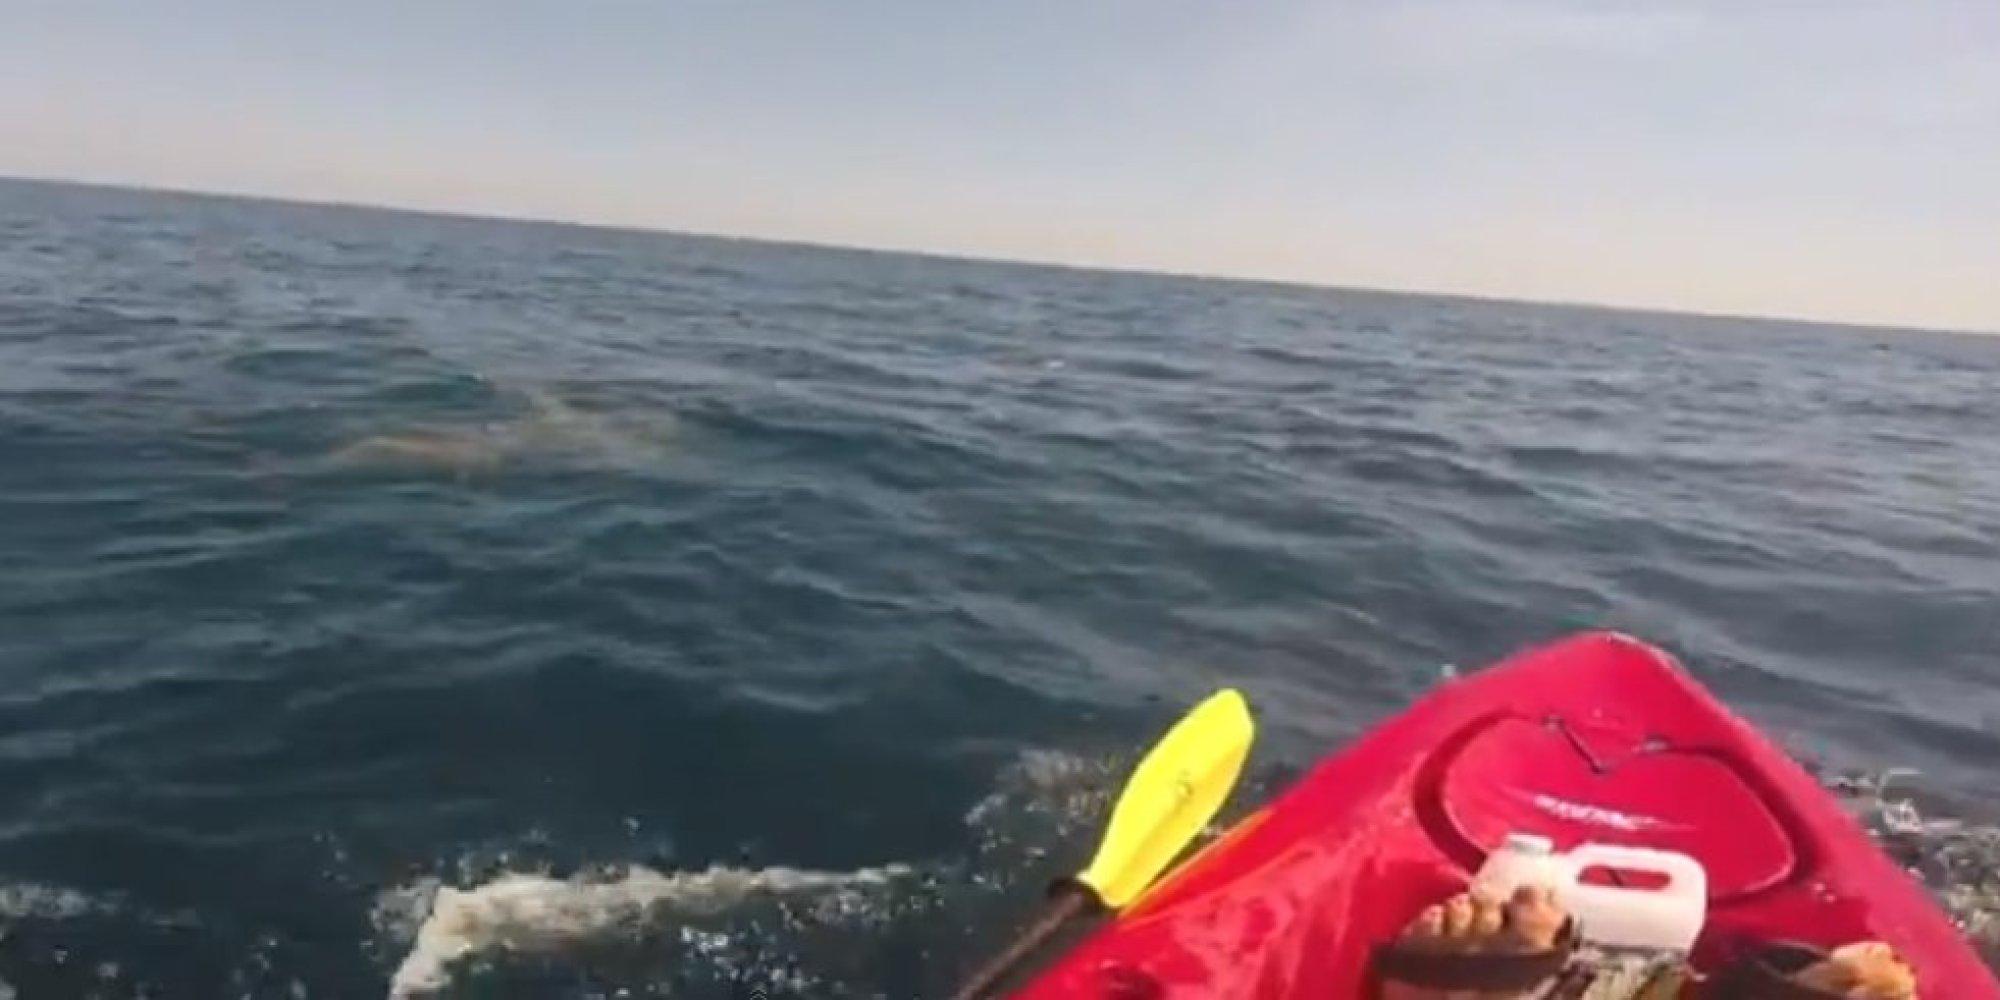 Hammerhead Shark Drags Man in